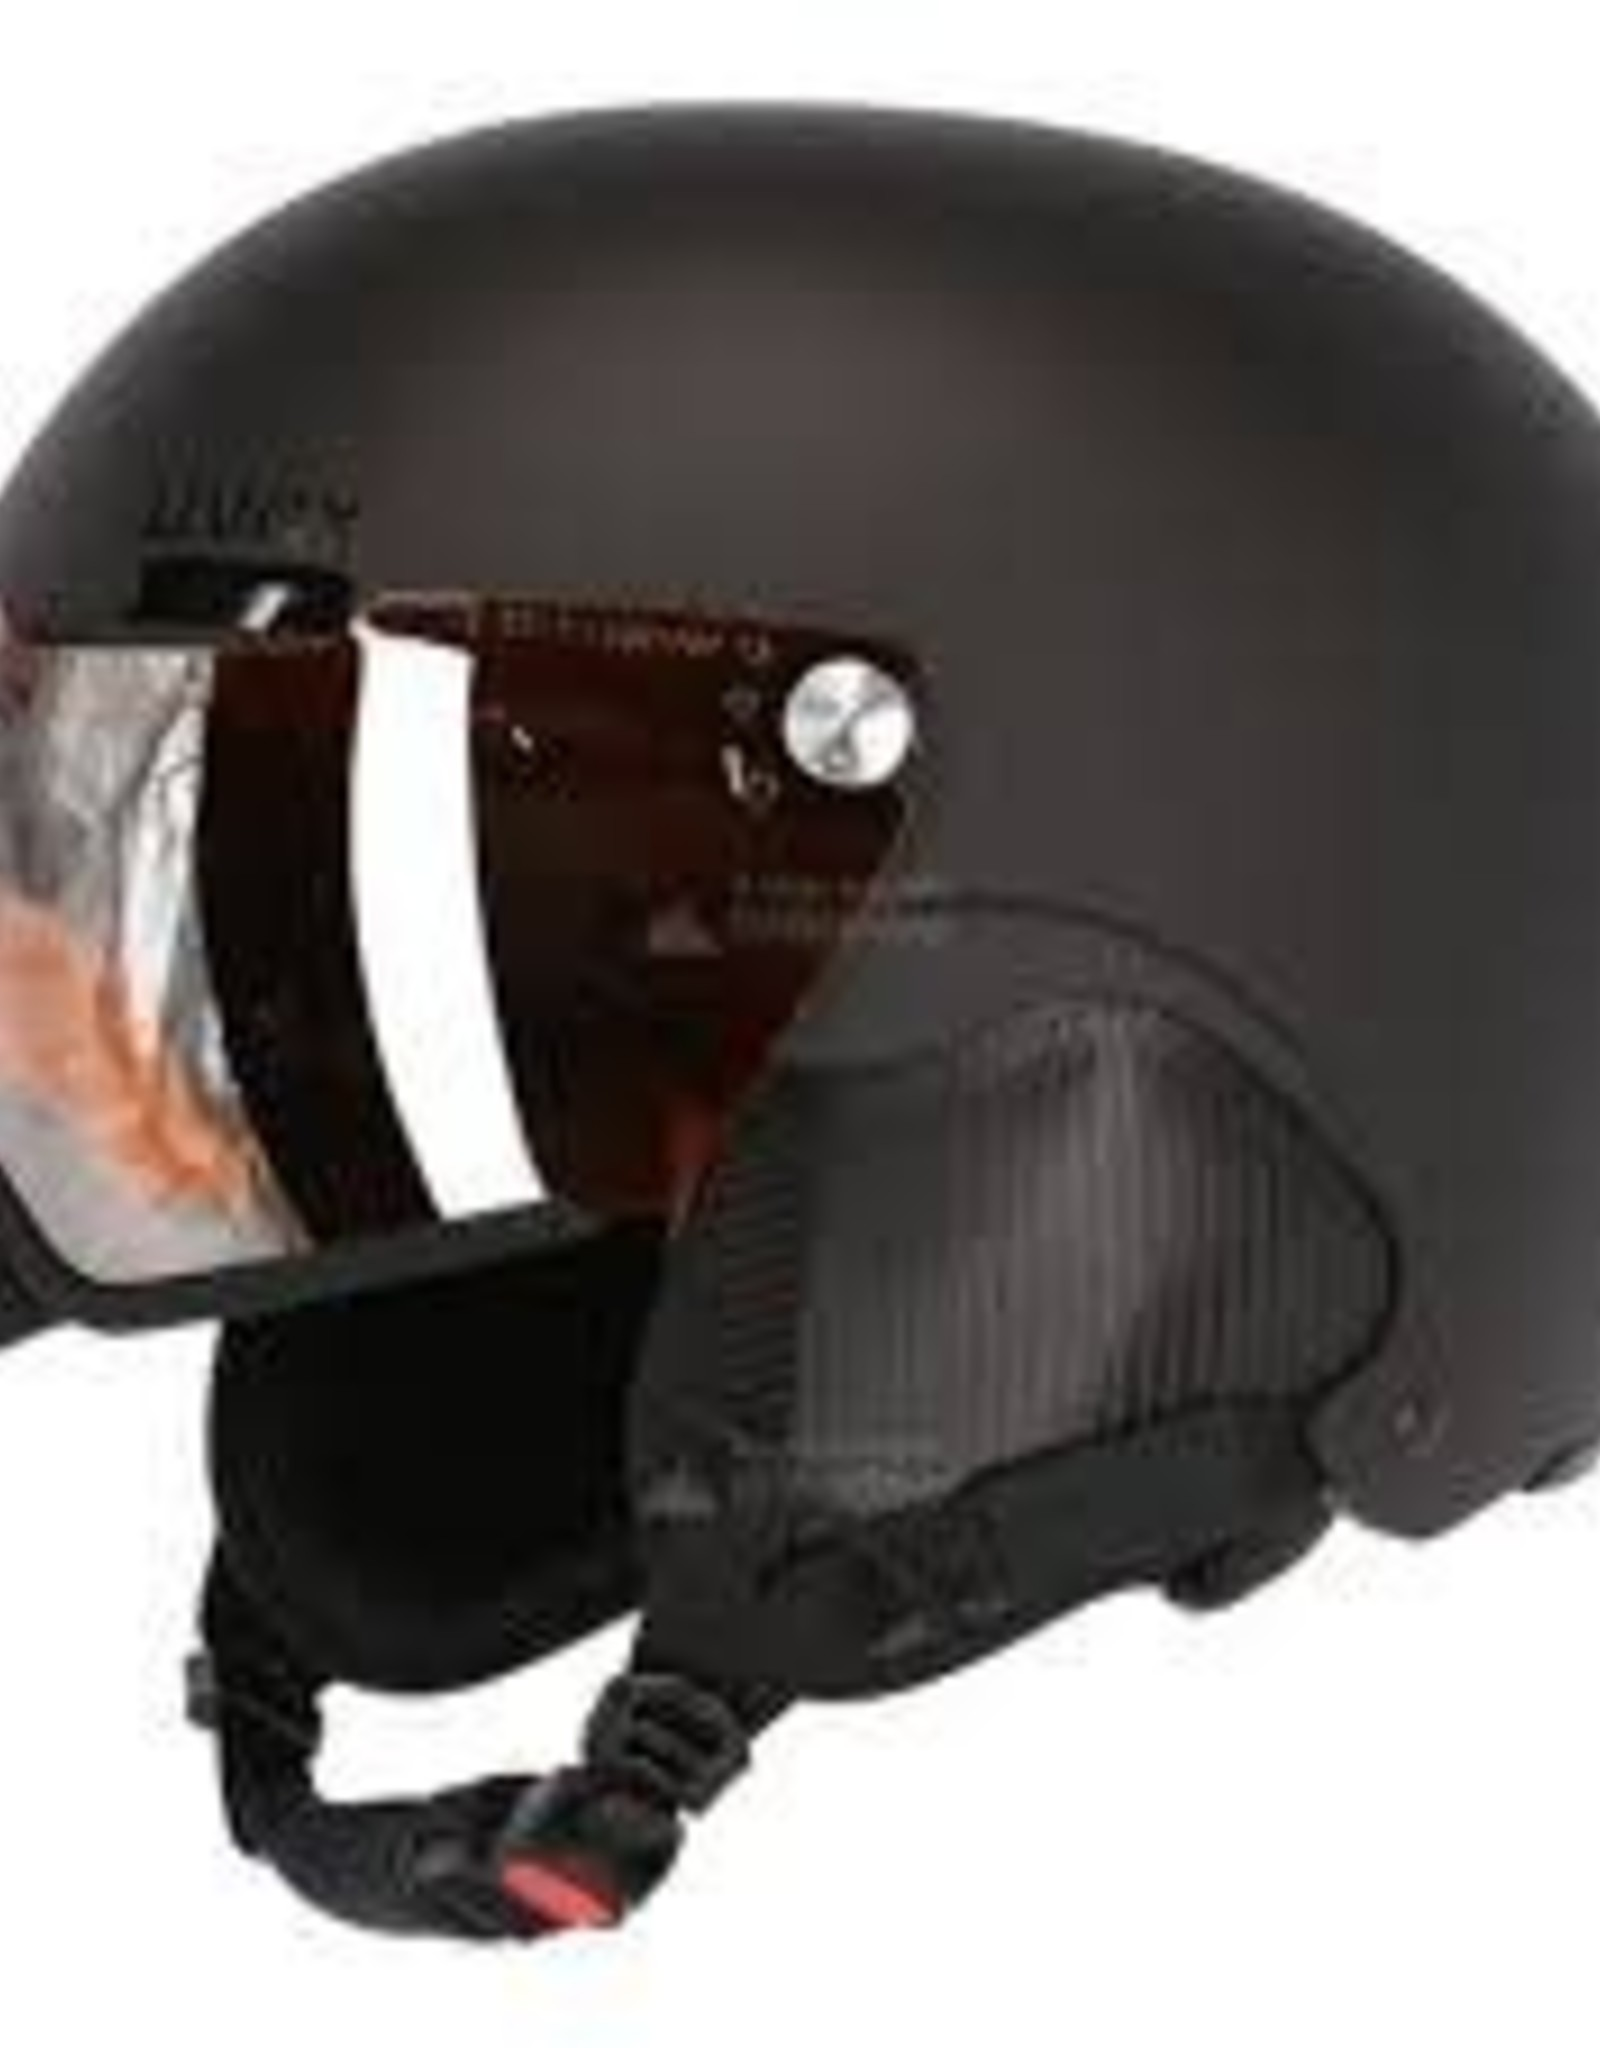 Uvex helmet 500 Visor